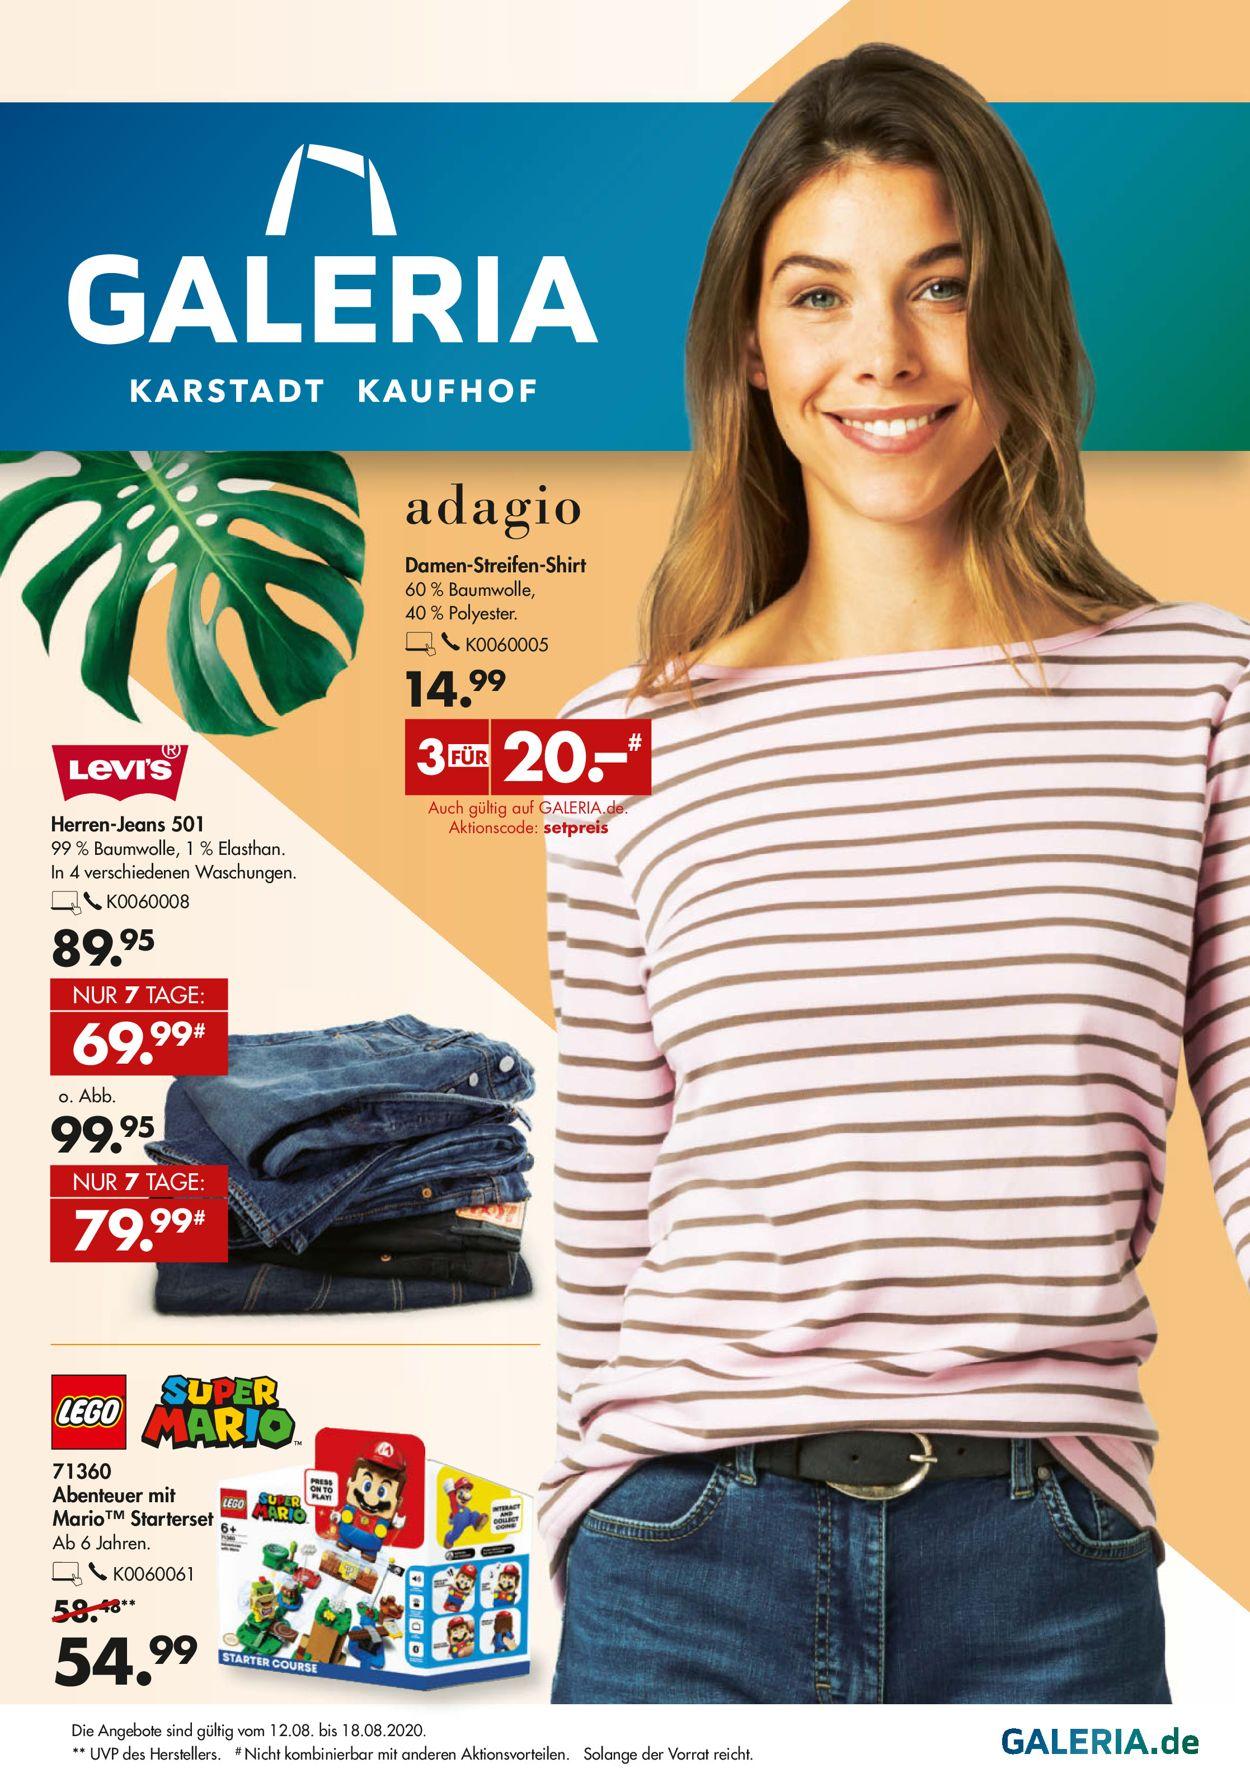 GALERIA Kaufhof Prospekt - Aktuell vom 12.08-18.08.2020